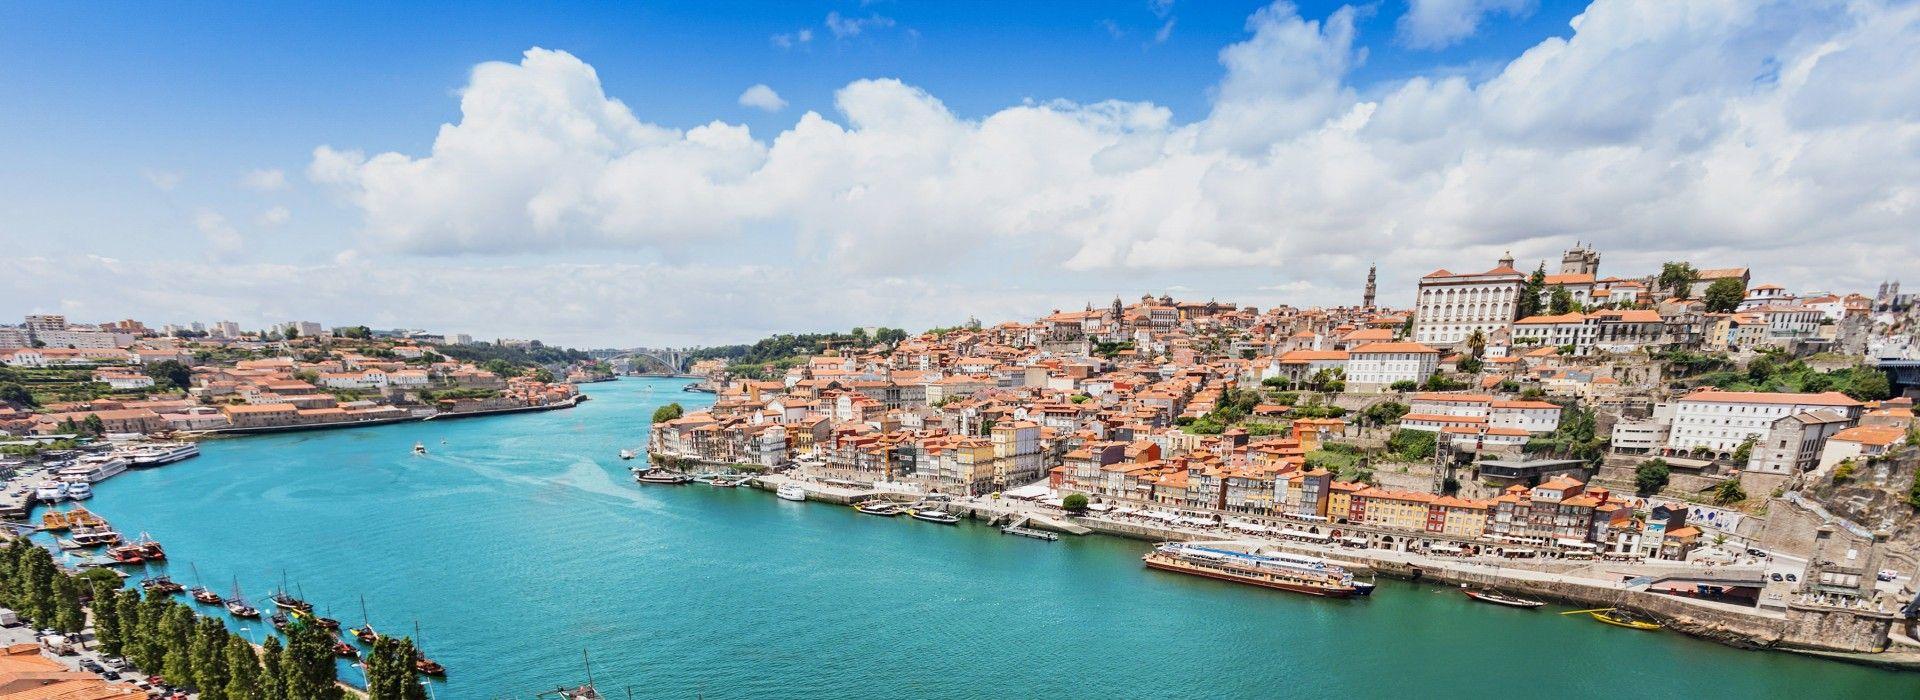 Natural landmarks sightseeing Tours in Lisbon